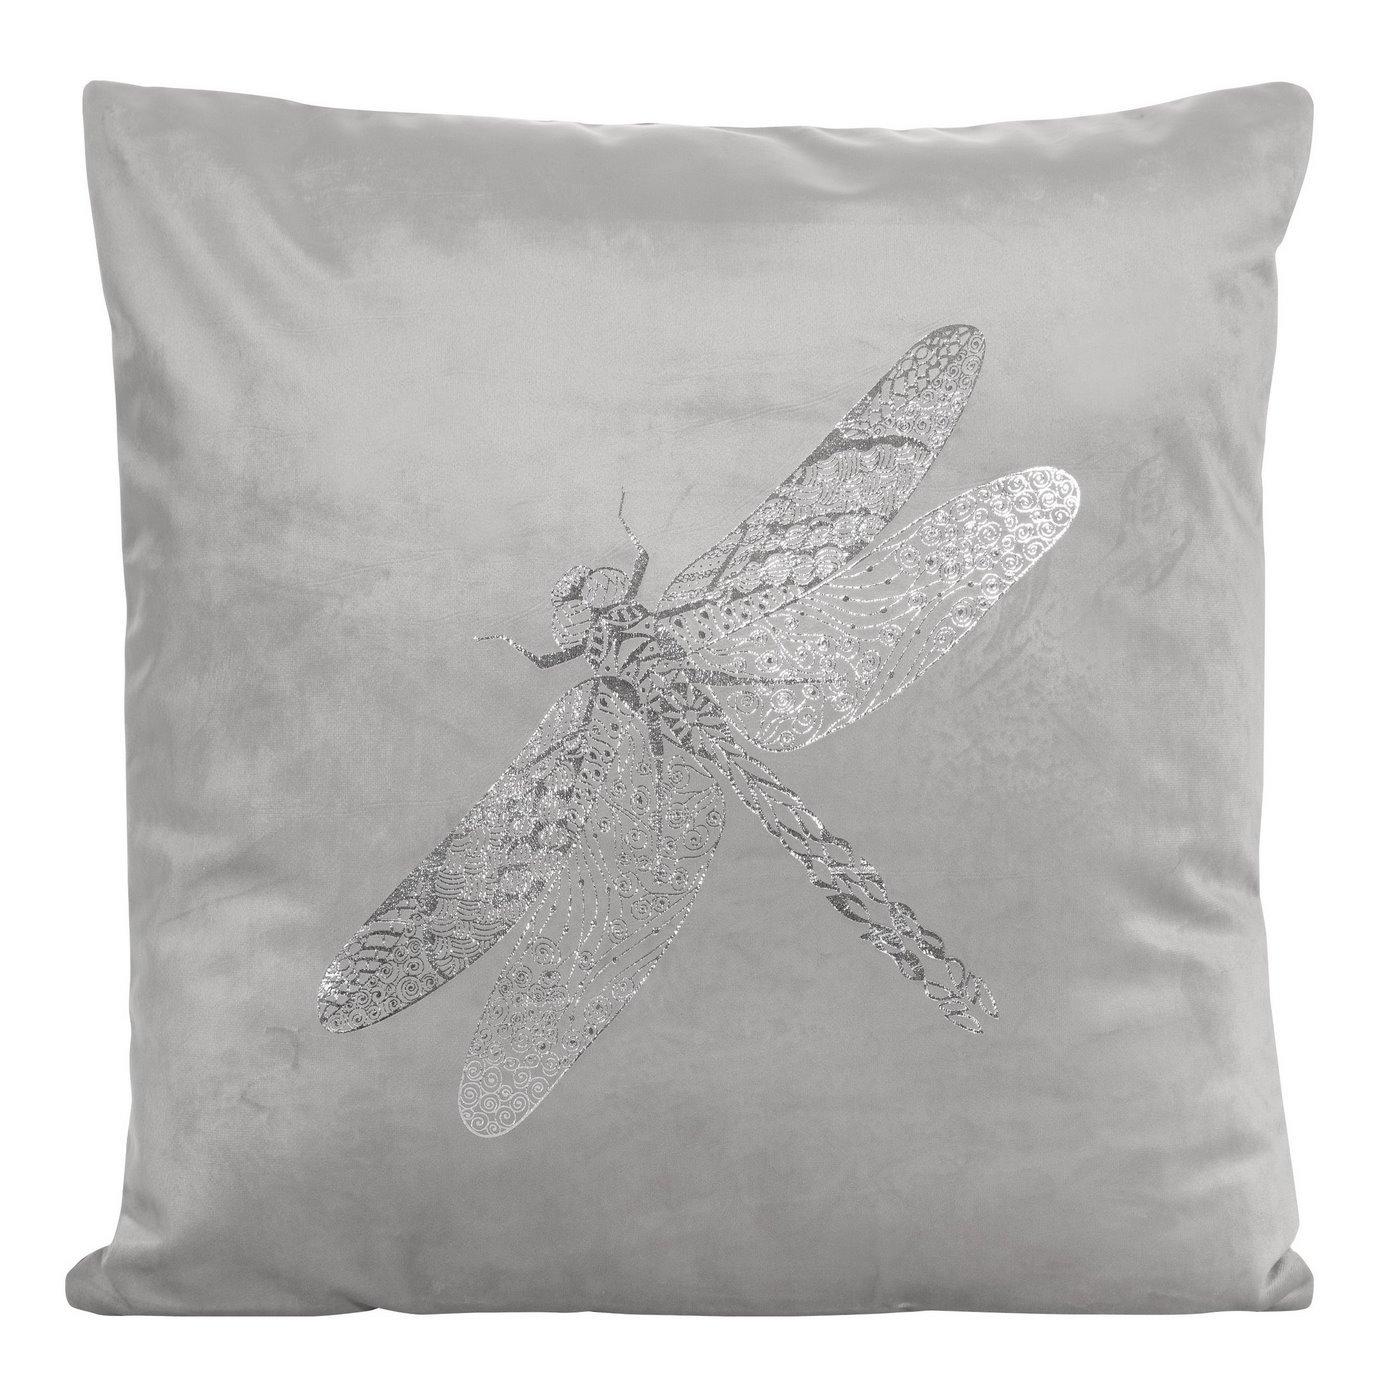 Poszewka na poduszkę srebrna ze srebrną ważką 45 x 45 cm